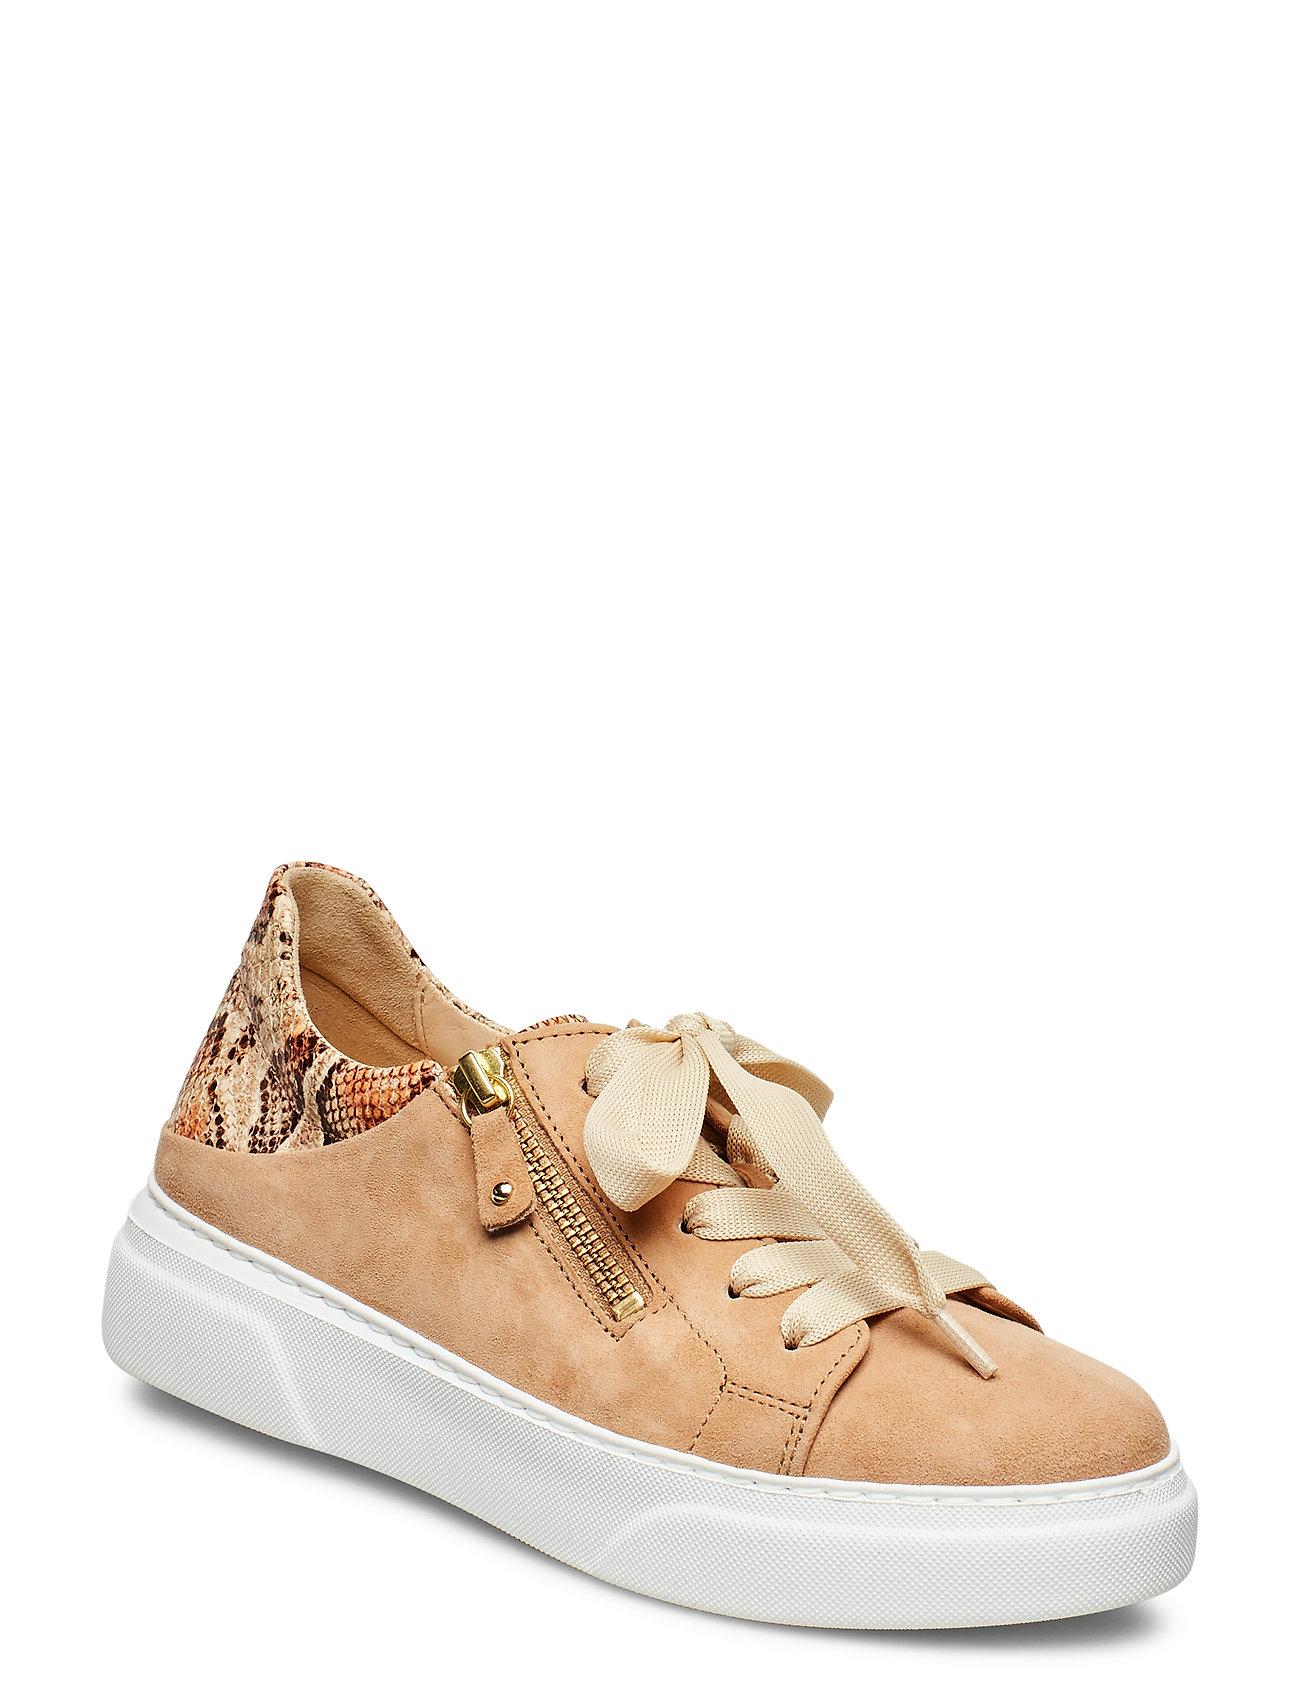 Image of Sneaker Low-top Sneakers Beige Gabor (3373405979)